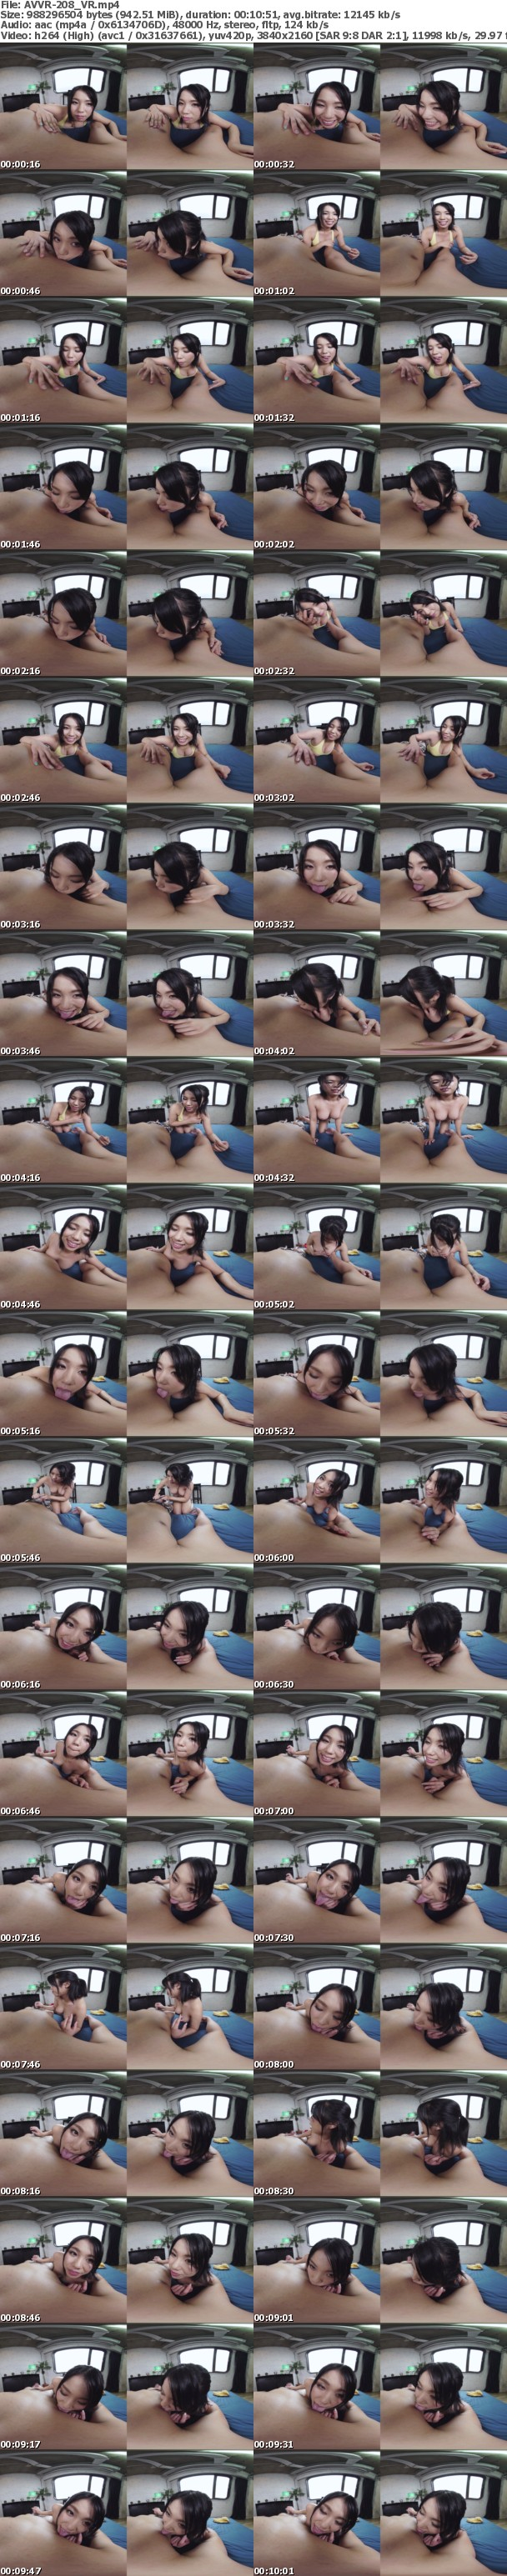 VR/3D AVVR-208 【VR】ラブラブちゅっちゅっちゅ乳首舐め手コキ 水澤りこ